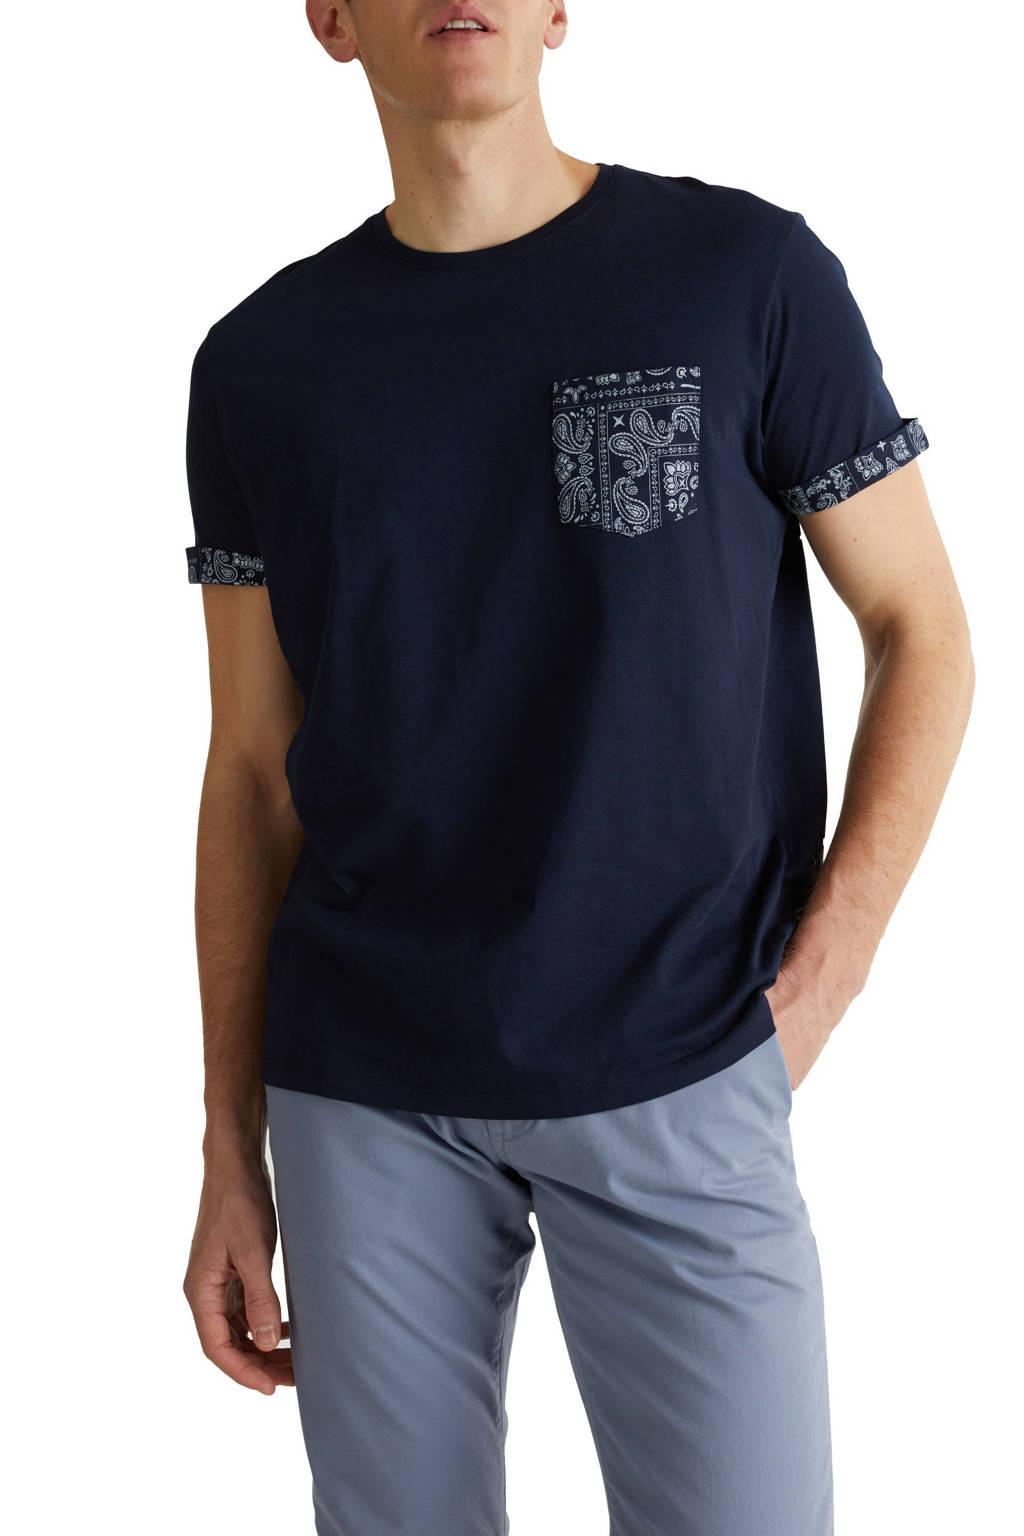 ESPRIT Men Casual T-shirt met printopdruk blauw, Blauw